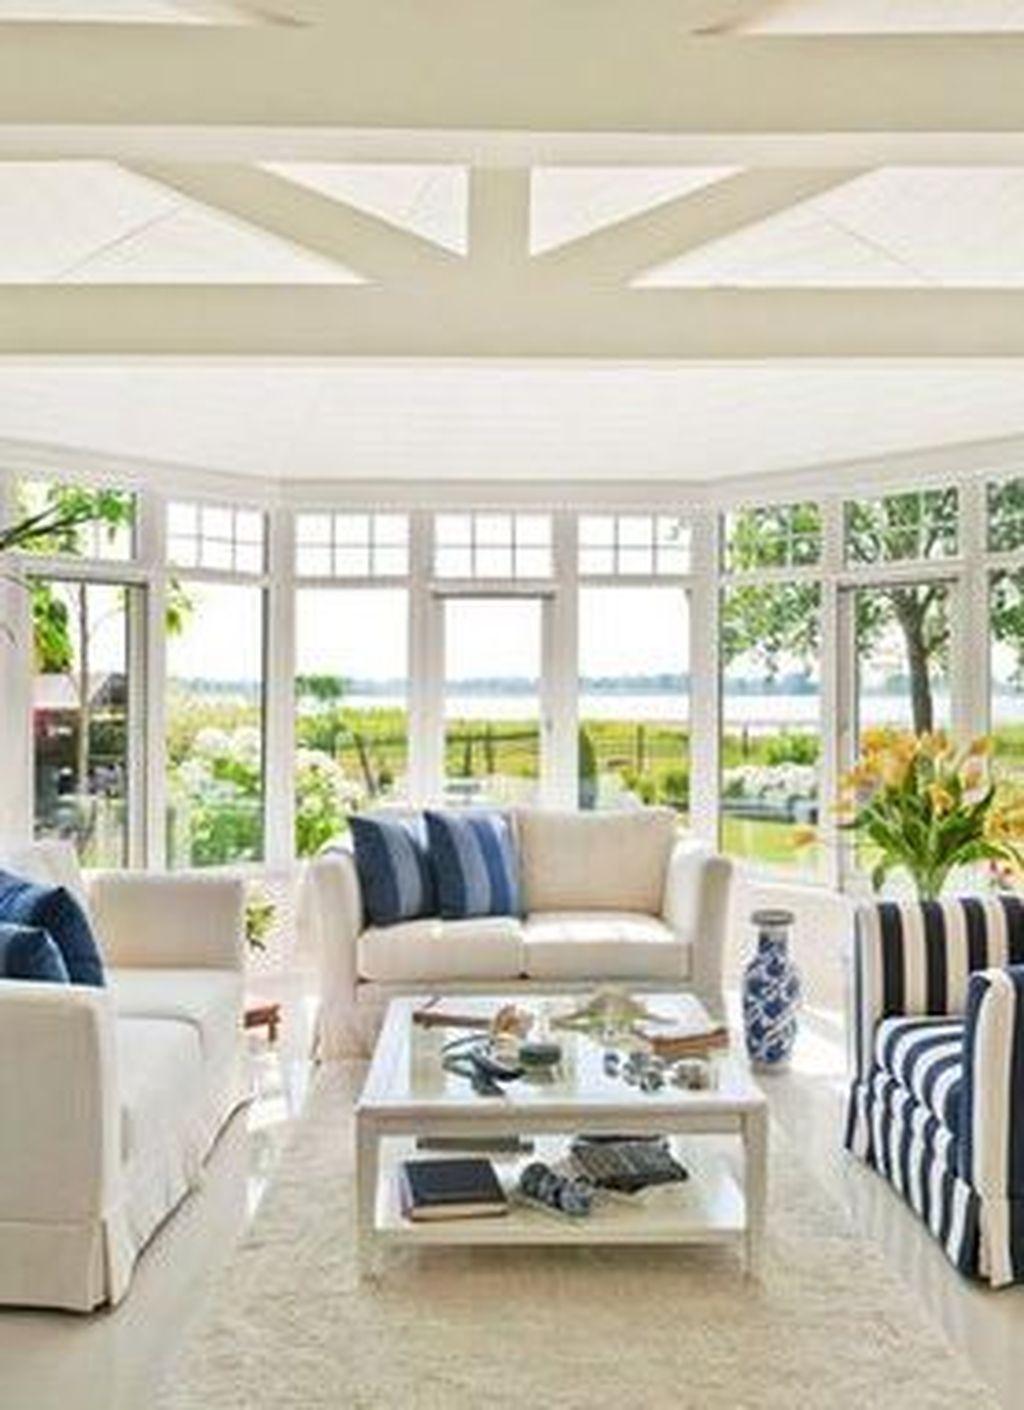 43 Perfect White Sunroom Design Ideas That Look So Awesome Sunroom Designs White Sunroom Design Awesome sunroom design ideas